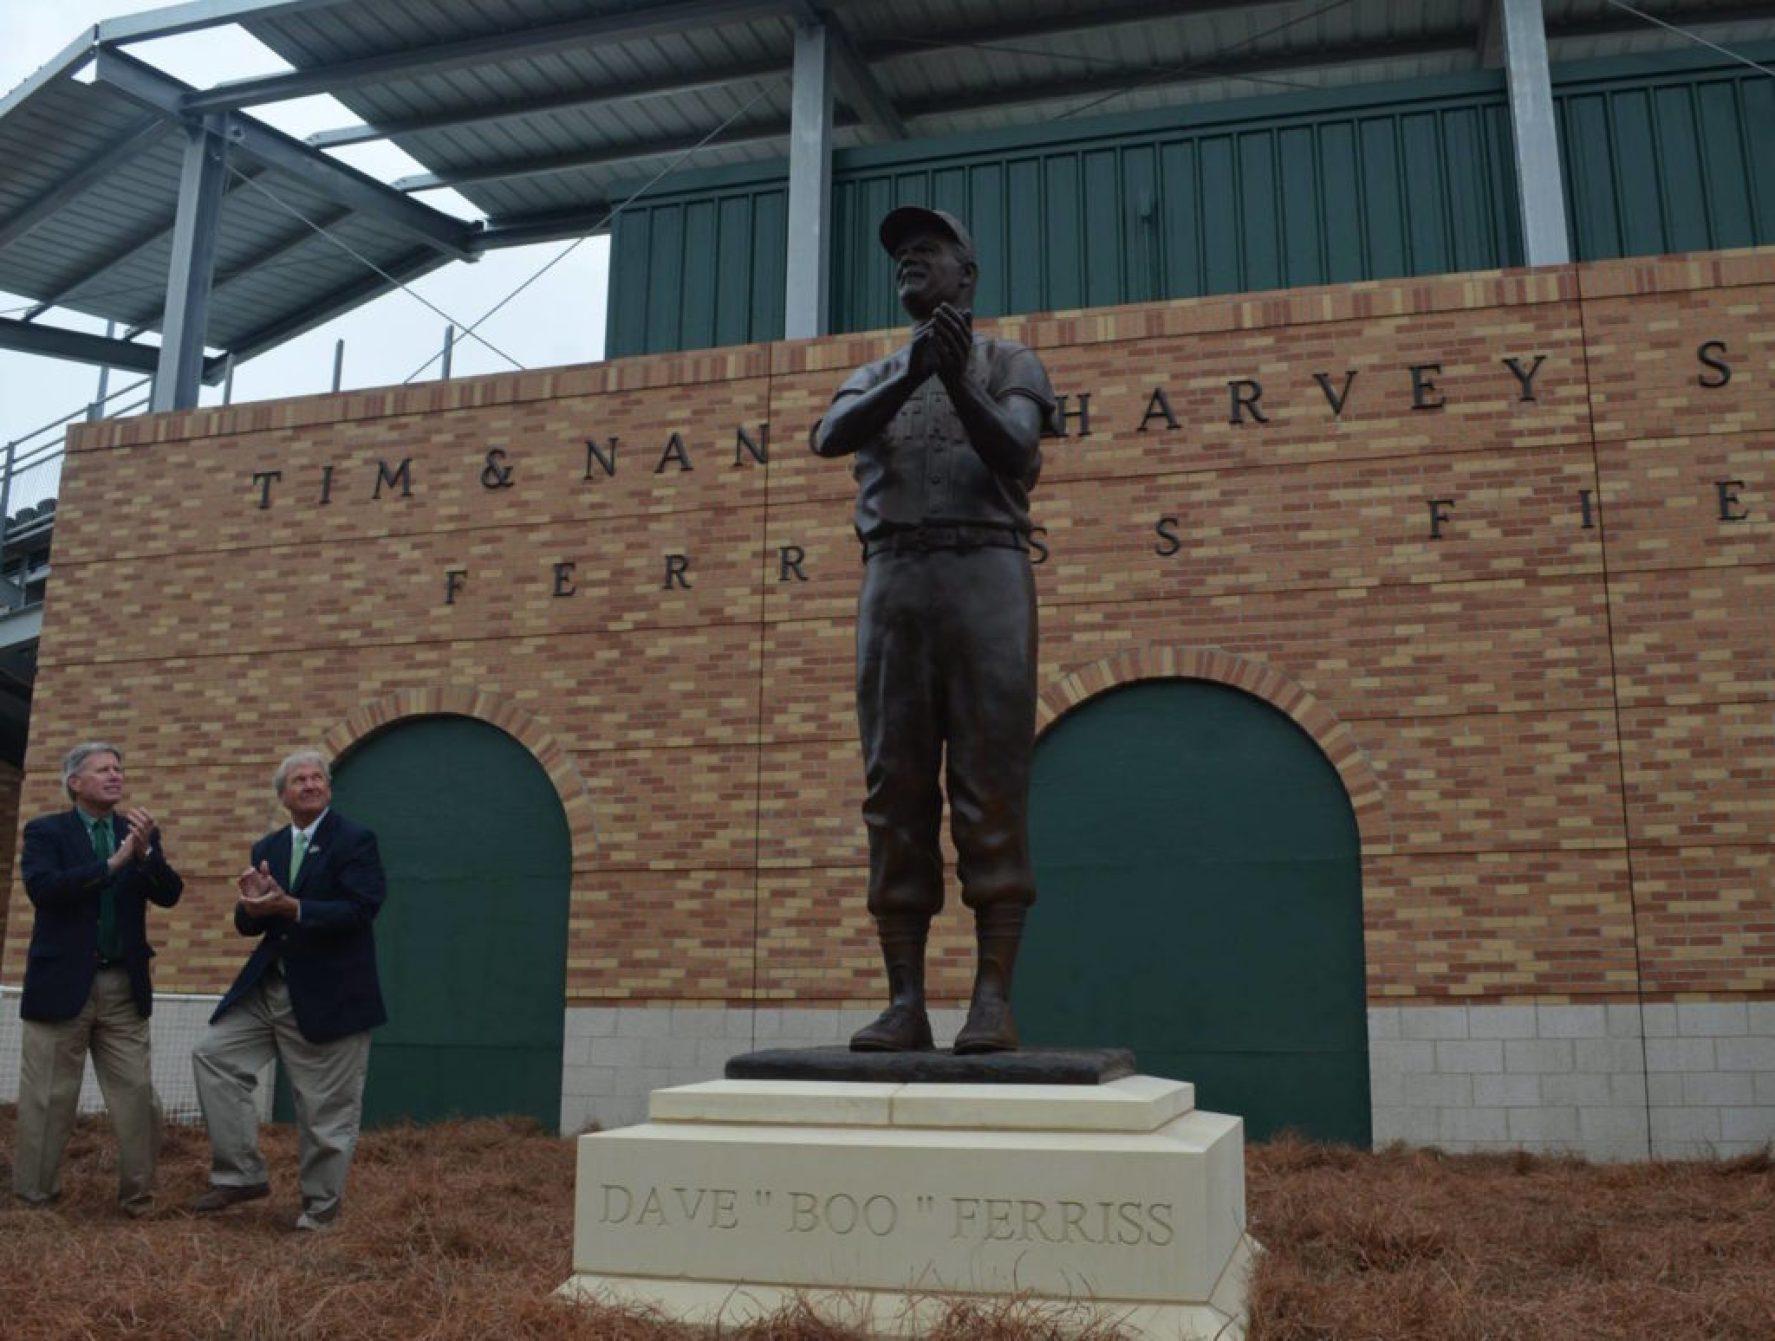 Ferriss statue